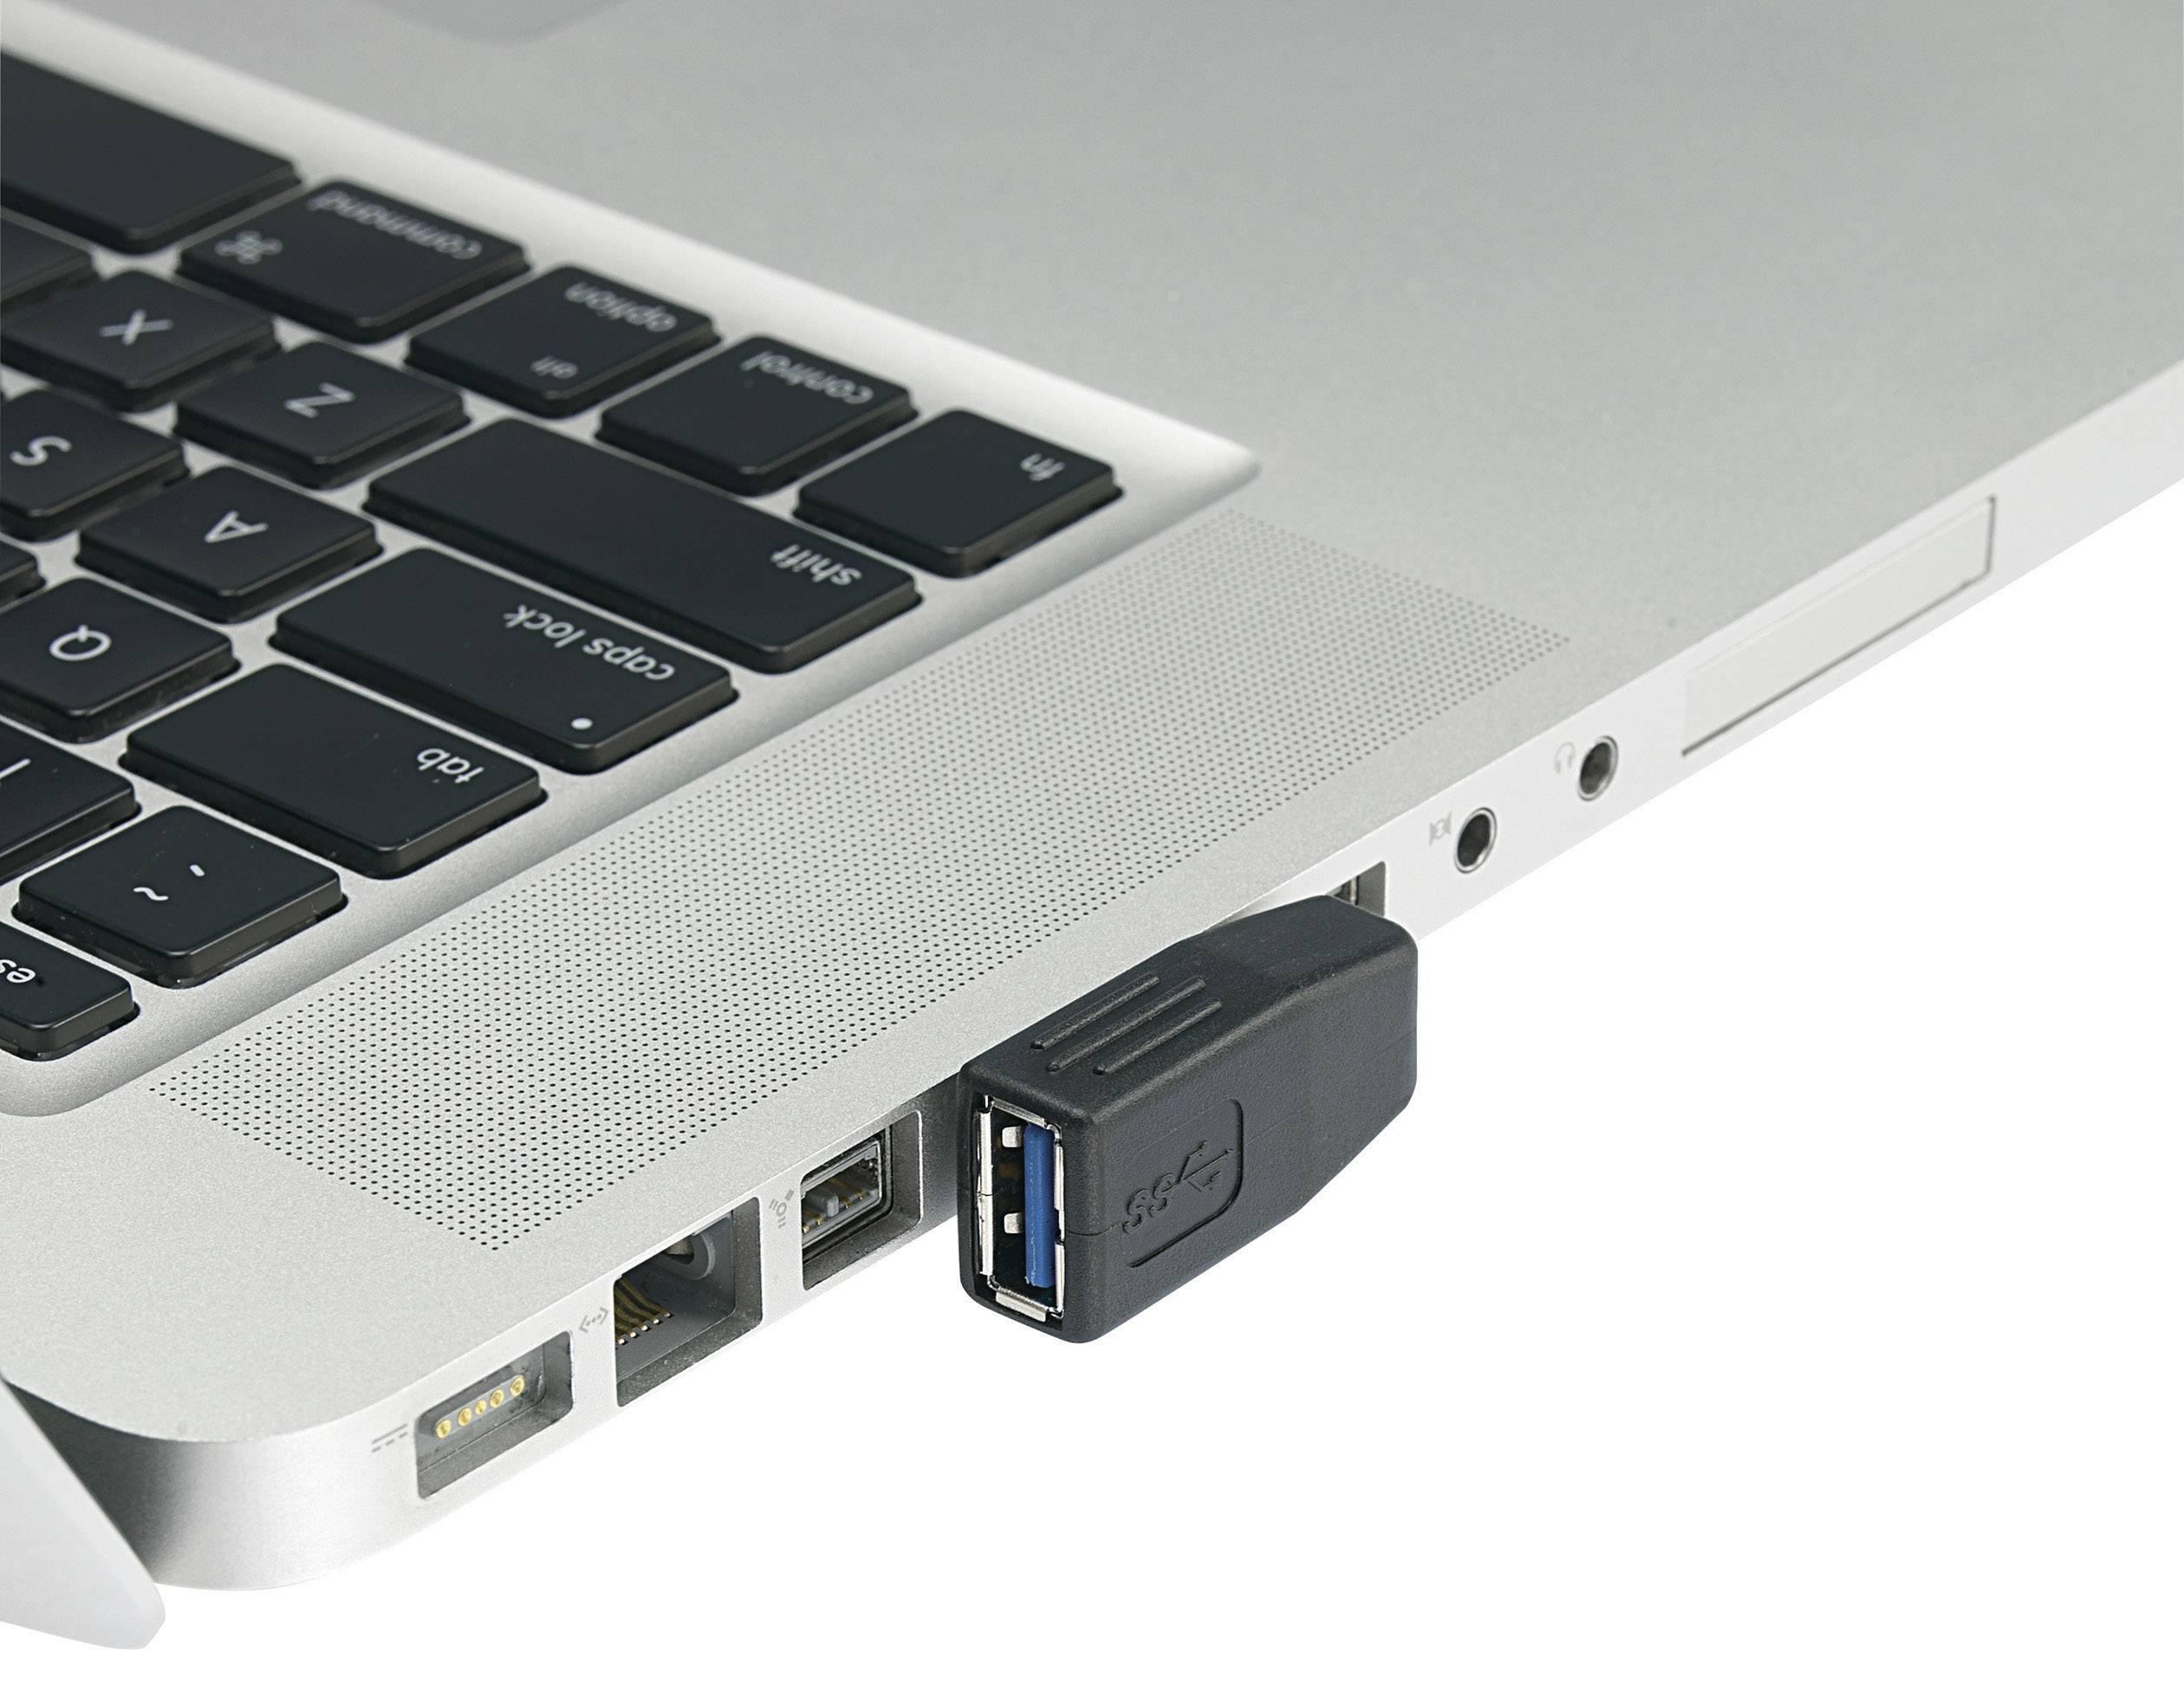 USB adaptér USB 3.0 Renkforce RF-4123944 0 m, čierna